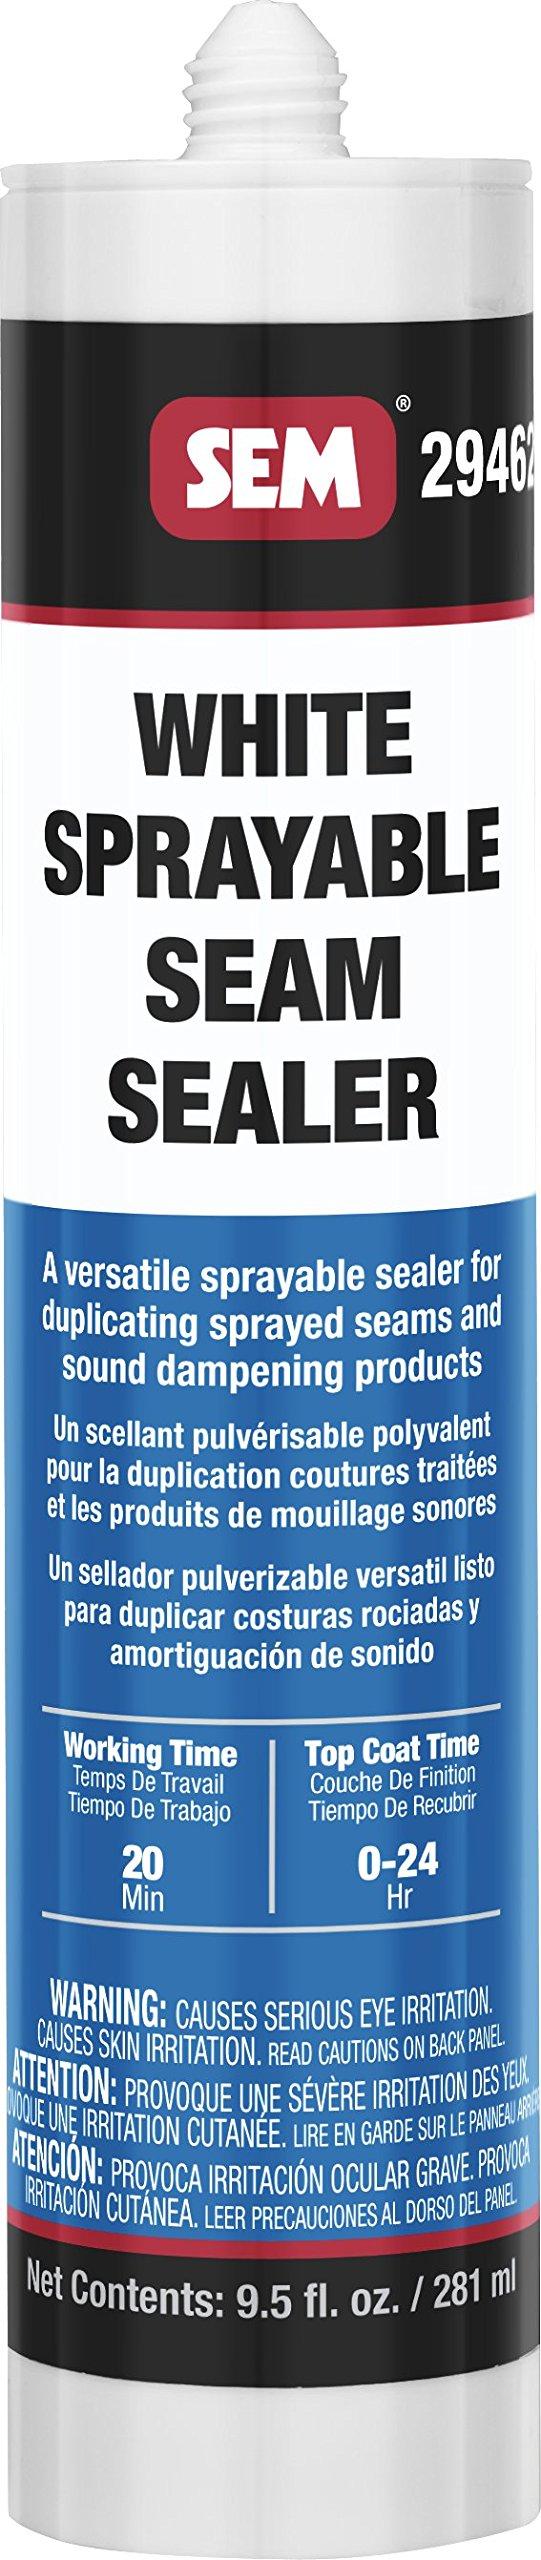 SEM 29462 1K White Seam Sealer, 9.5 Fluid_Ounces